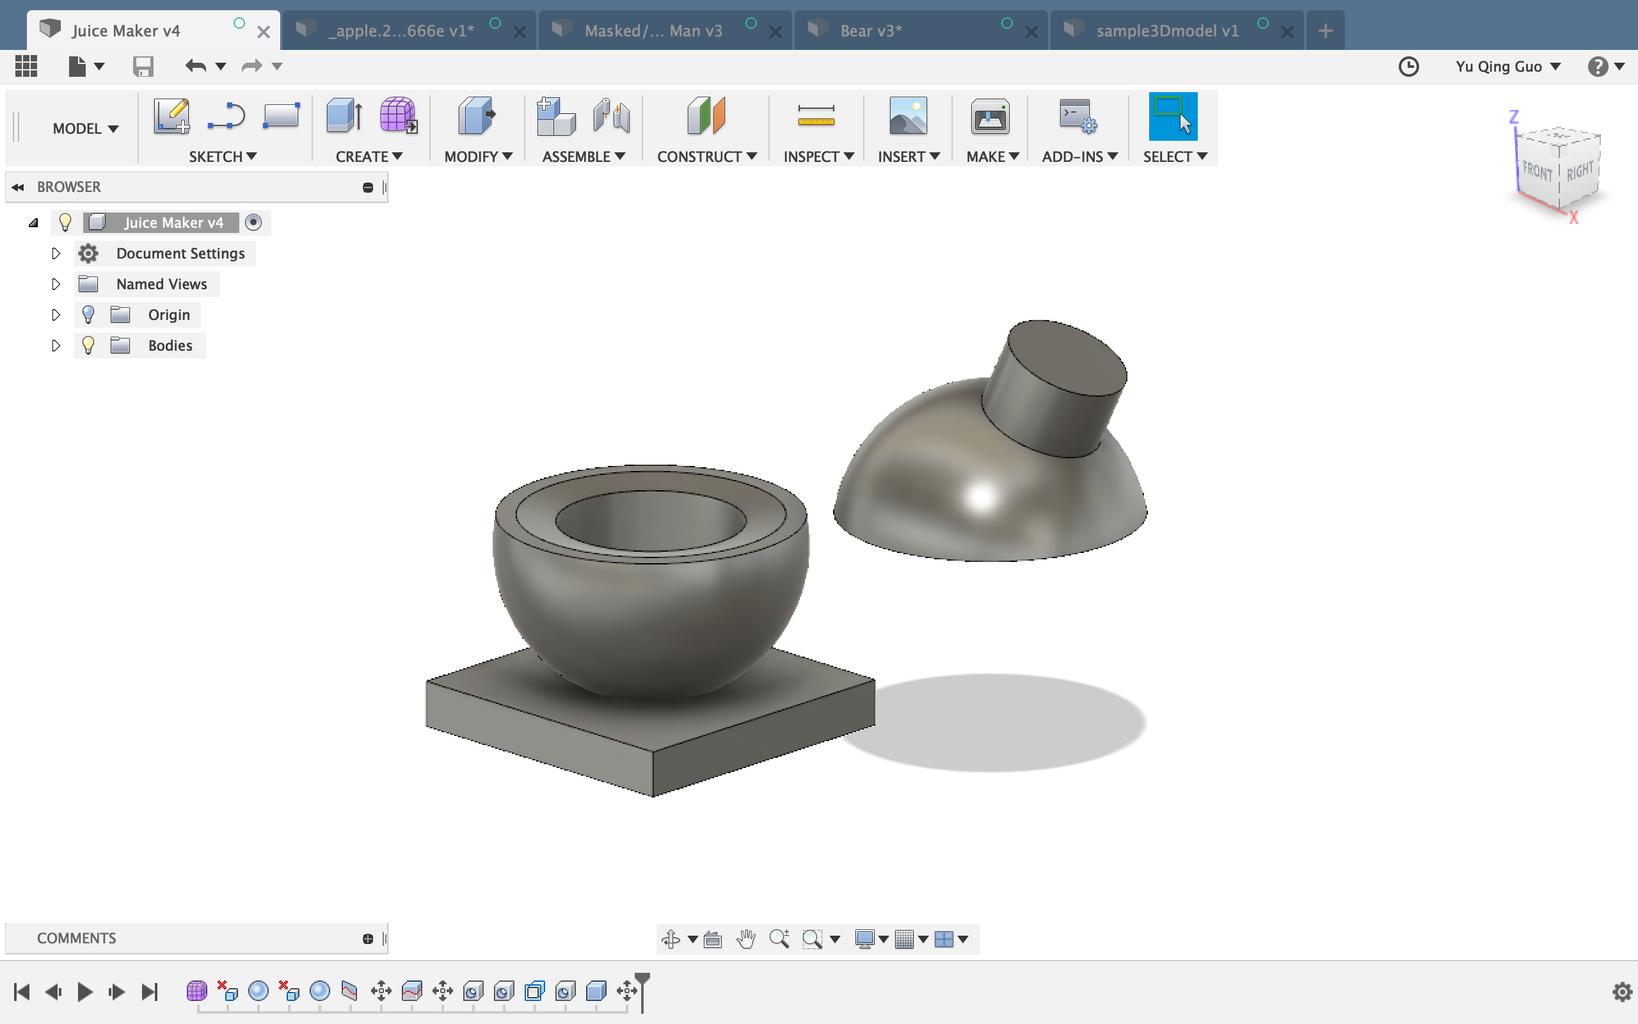 Design Prototypes - 3D Printing